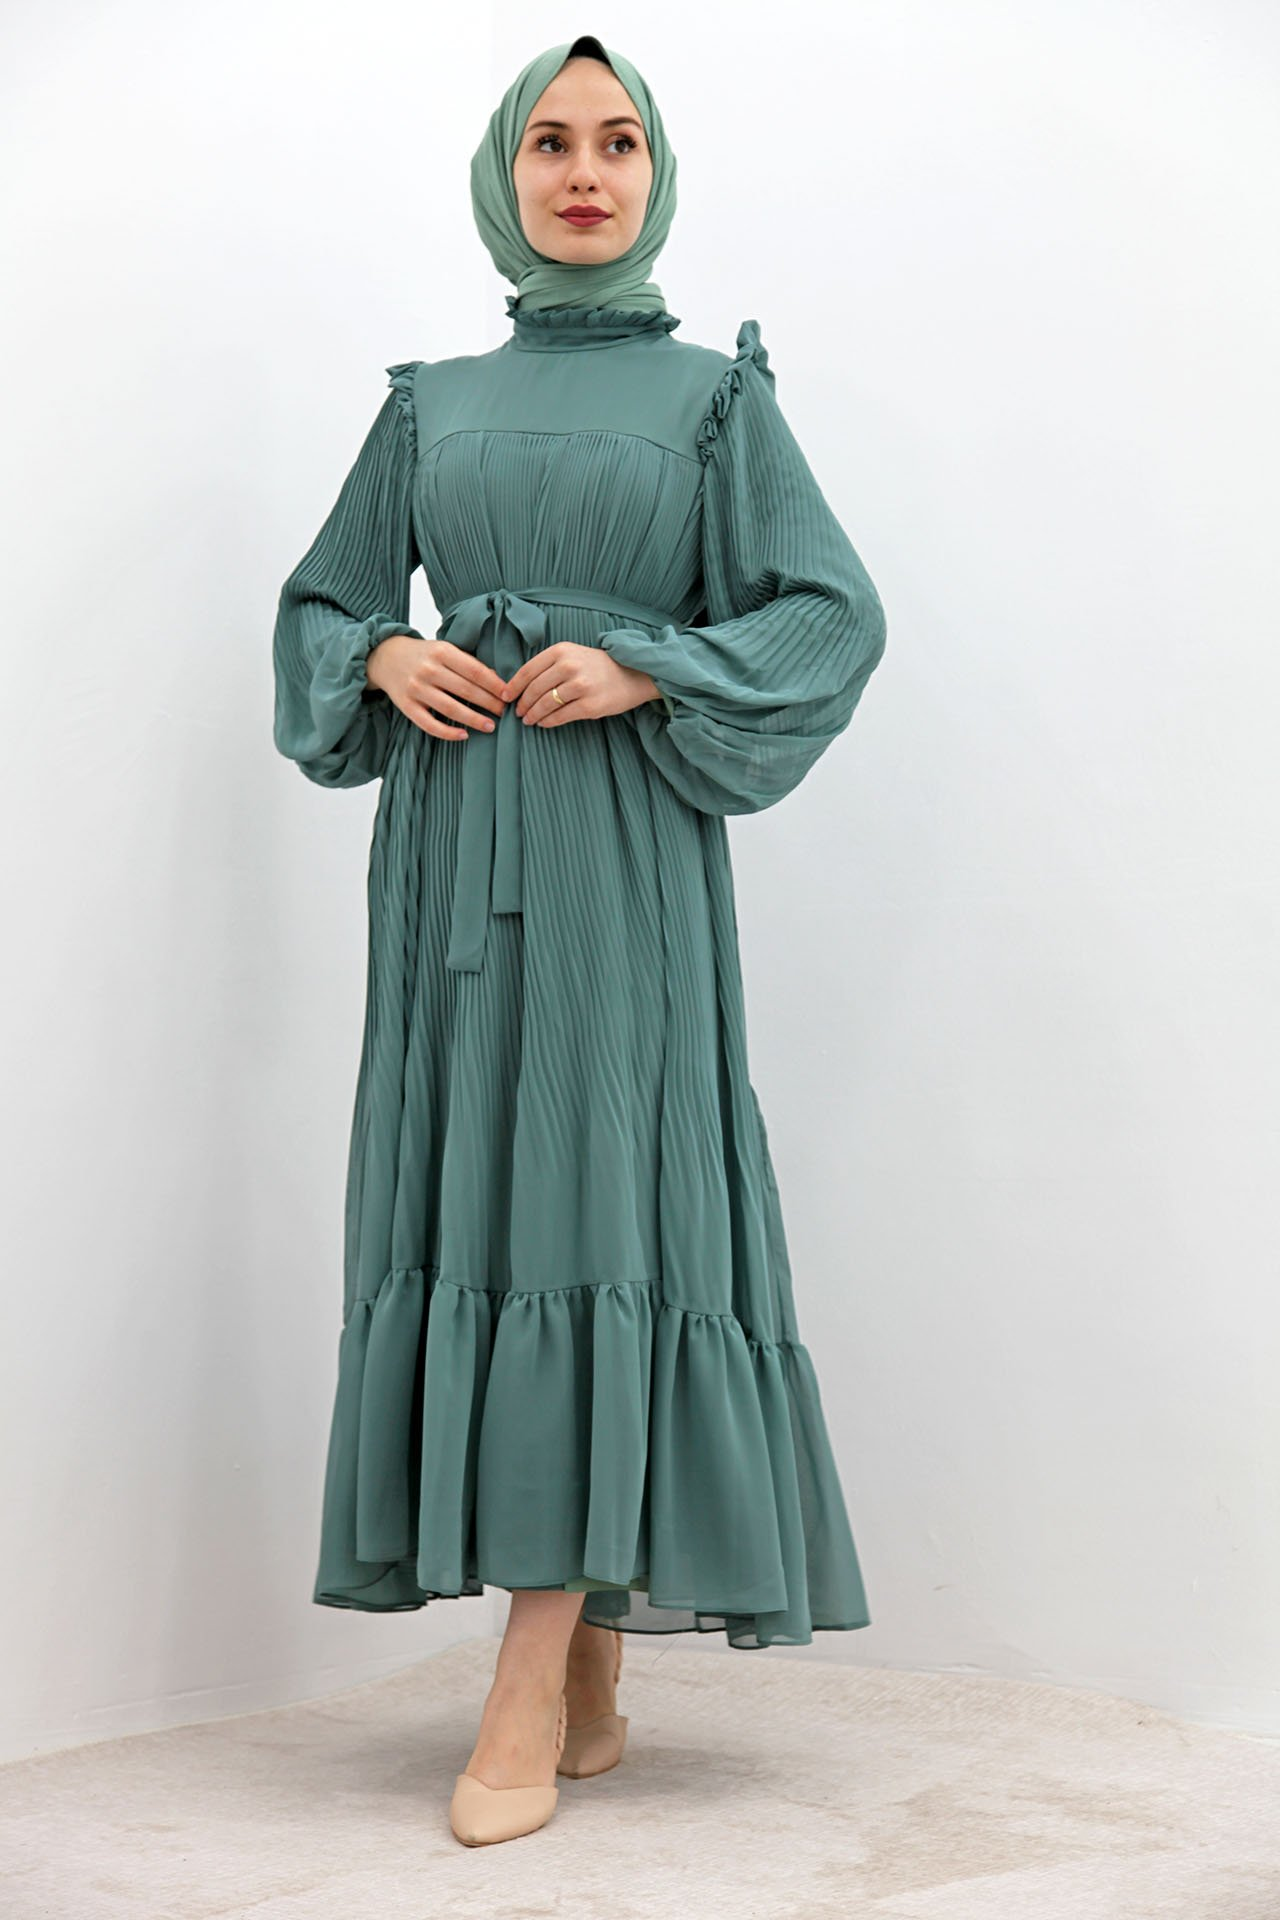 GİZAGİYİM - Omzu Fırfırlı Pilisoley Elbise Mint